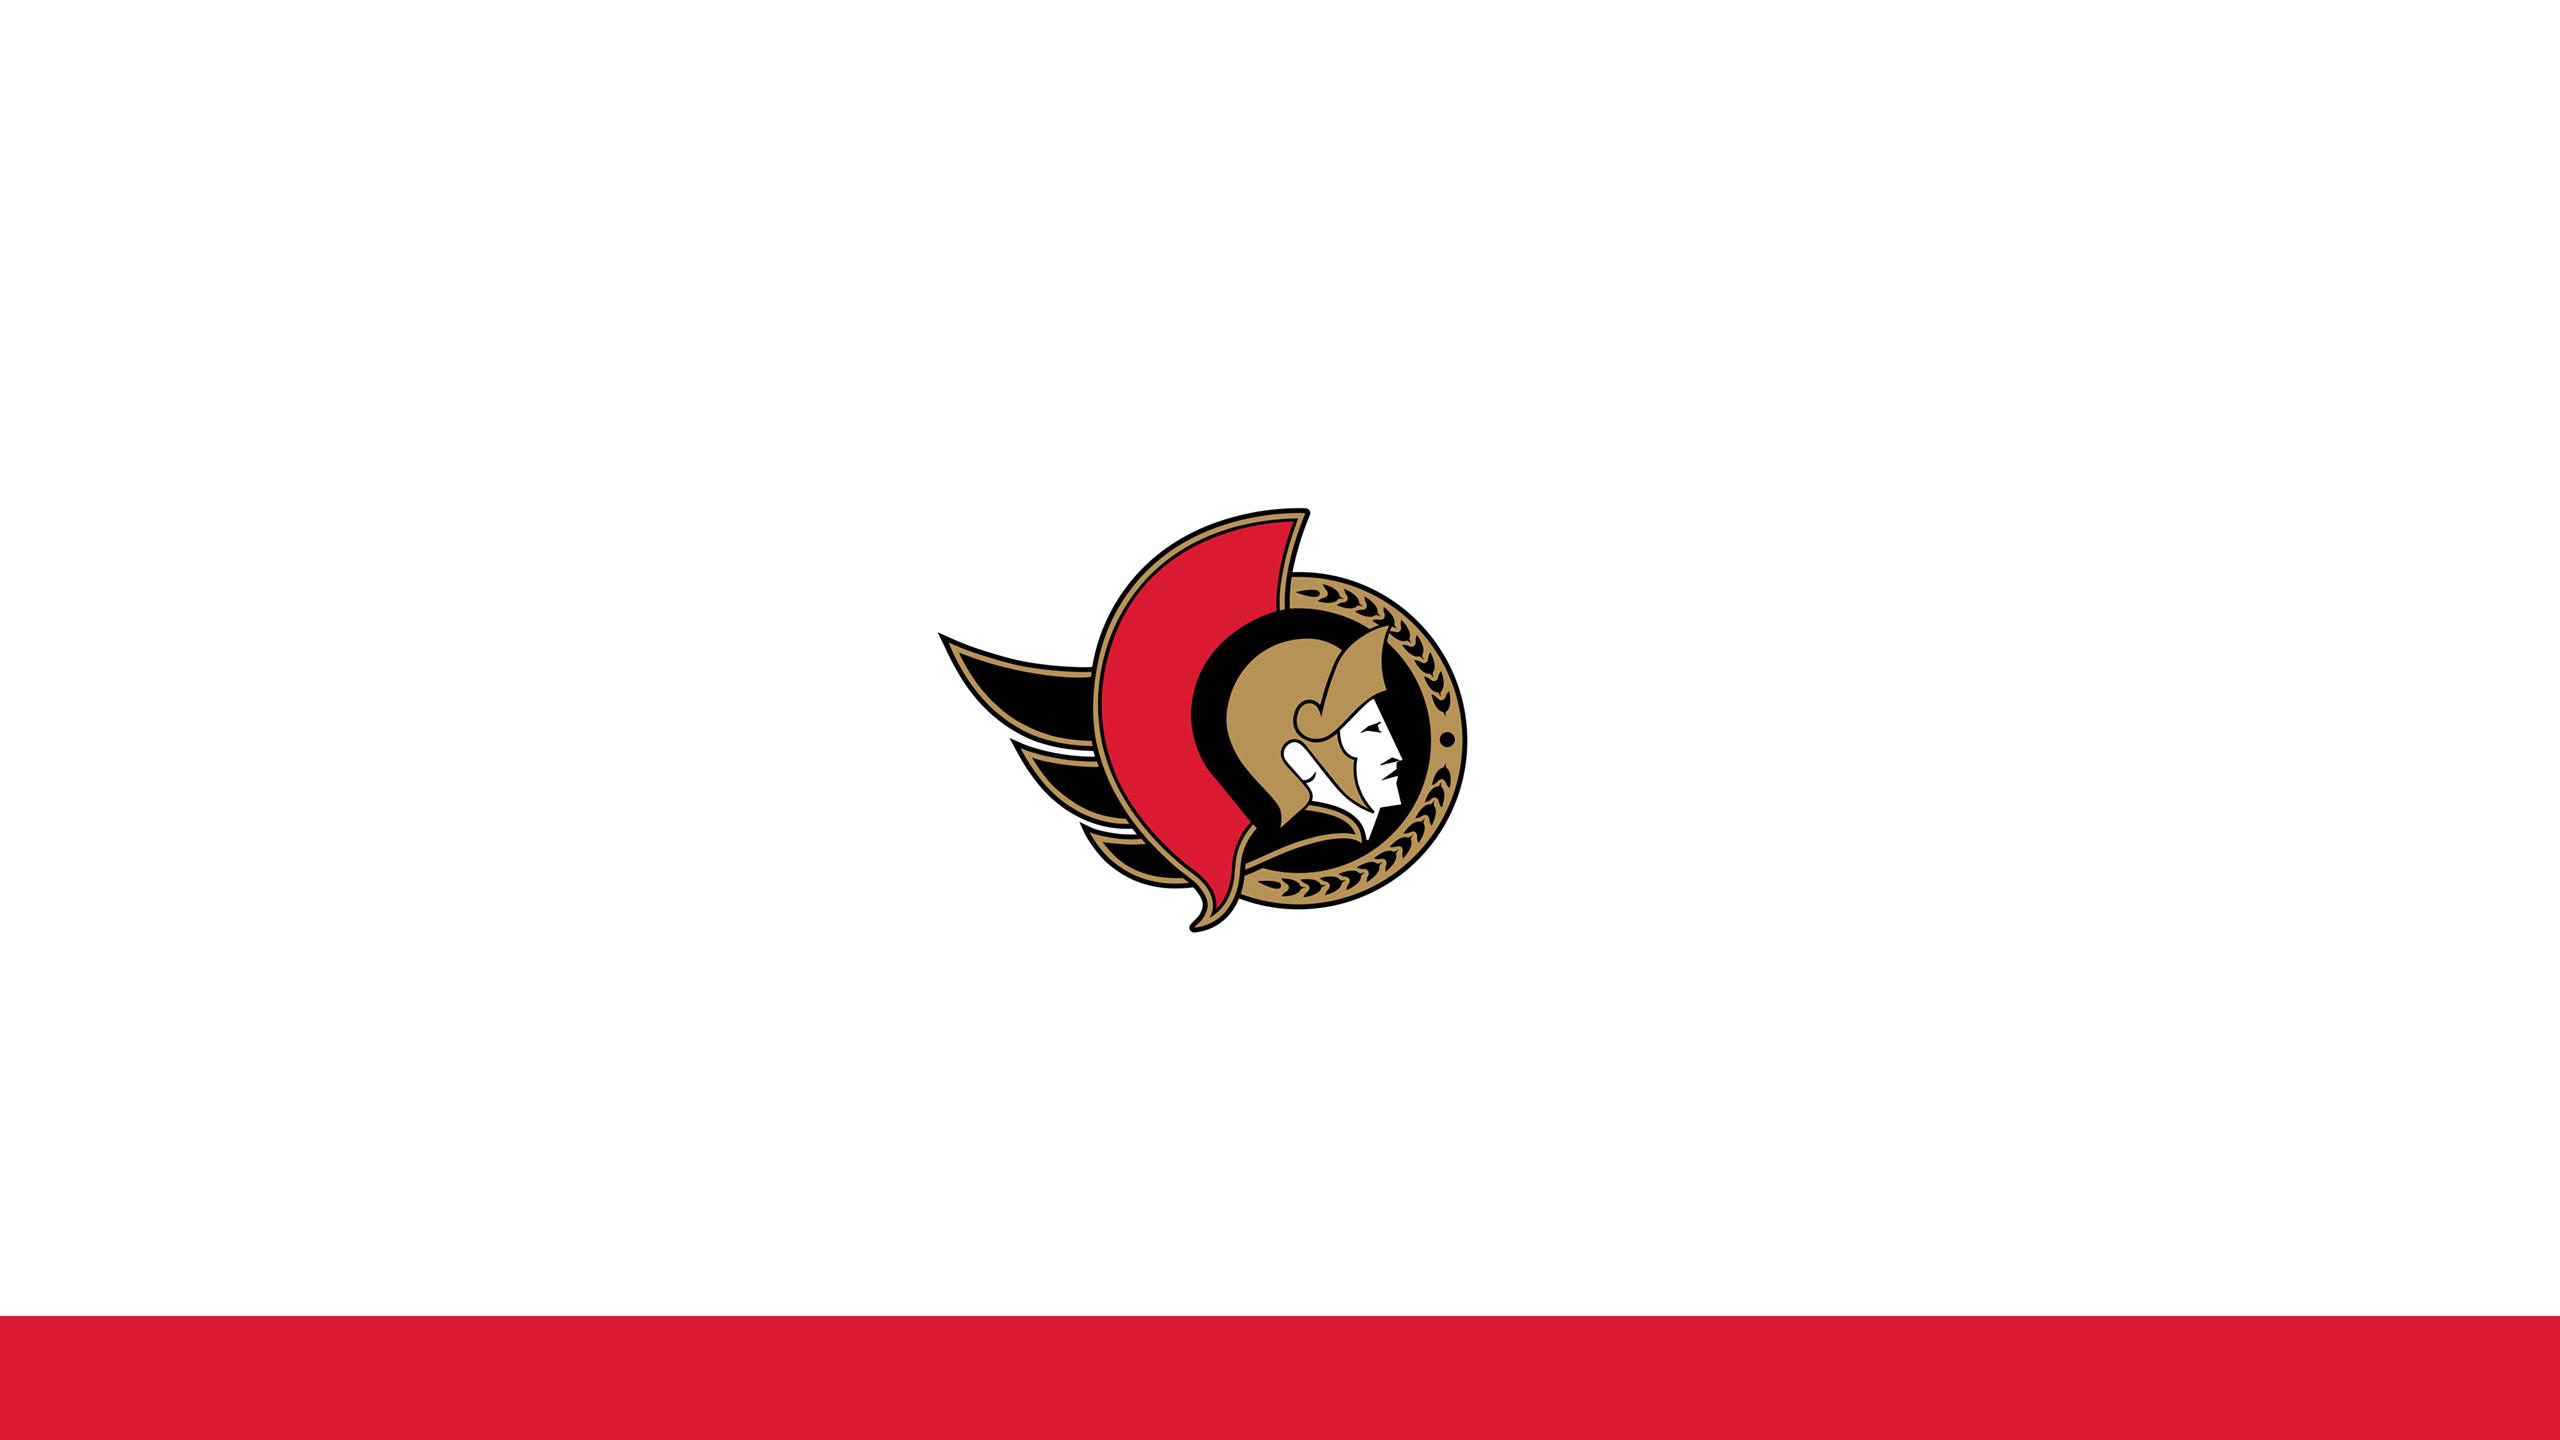 Ottawa Senators (Away)